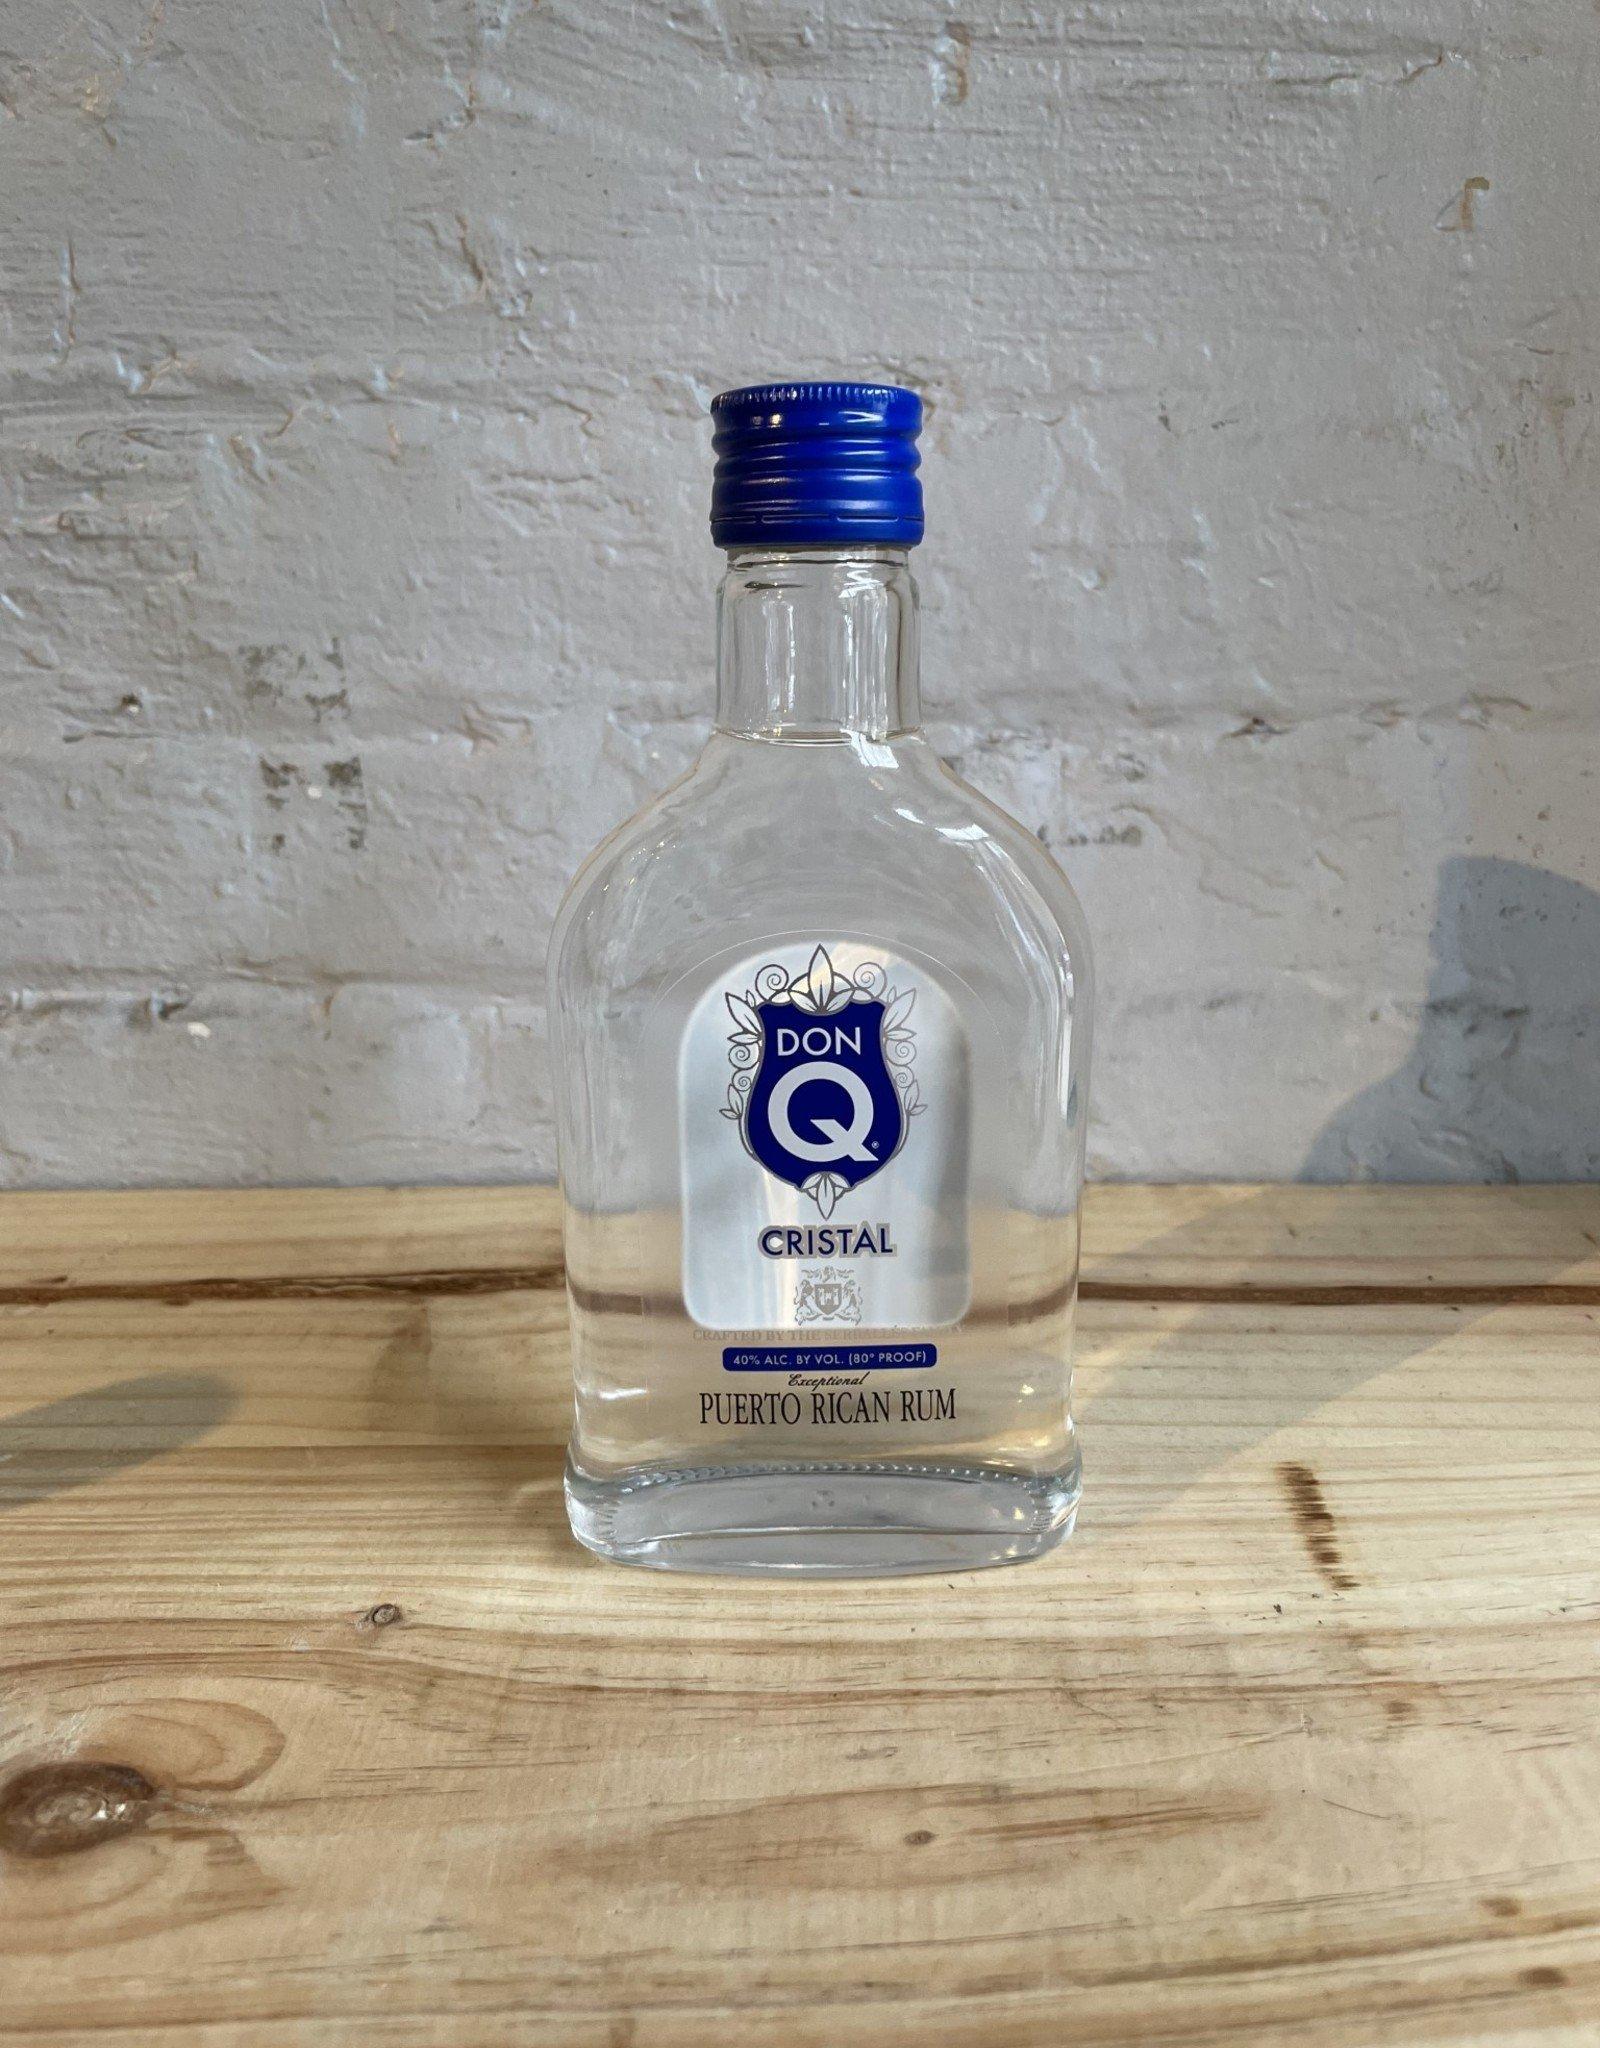 Don Q Cristal White Rum - Puerto Rico (200ml)